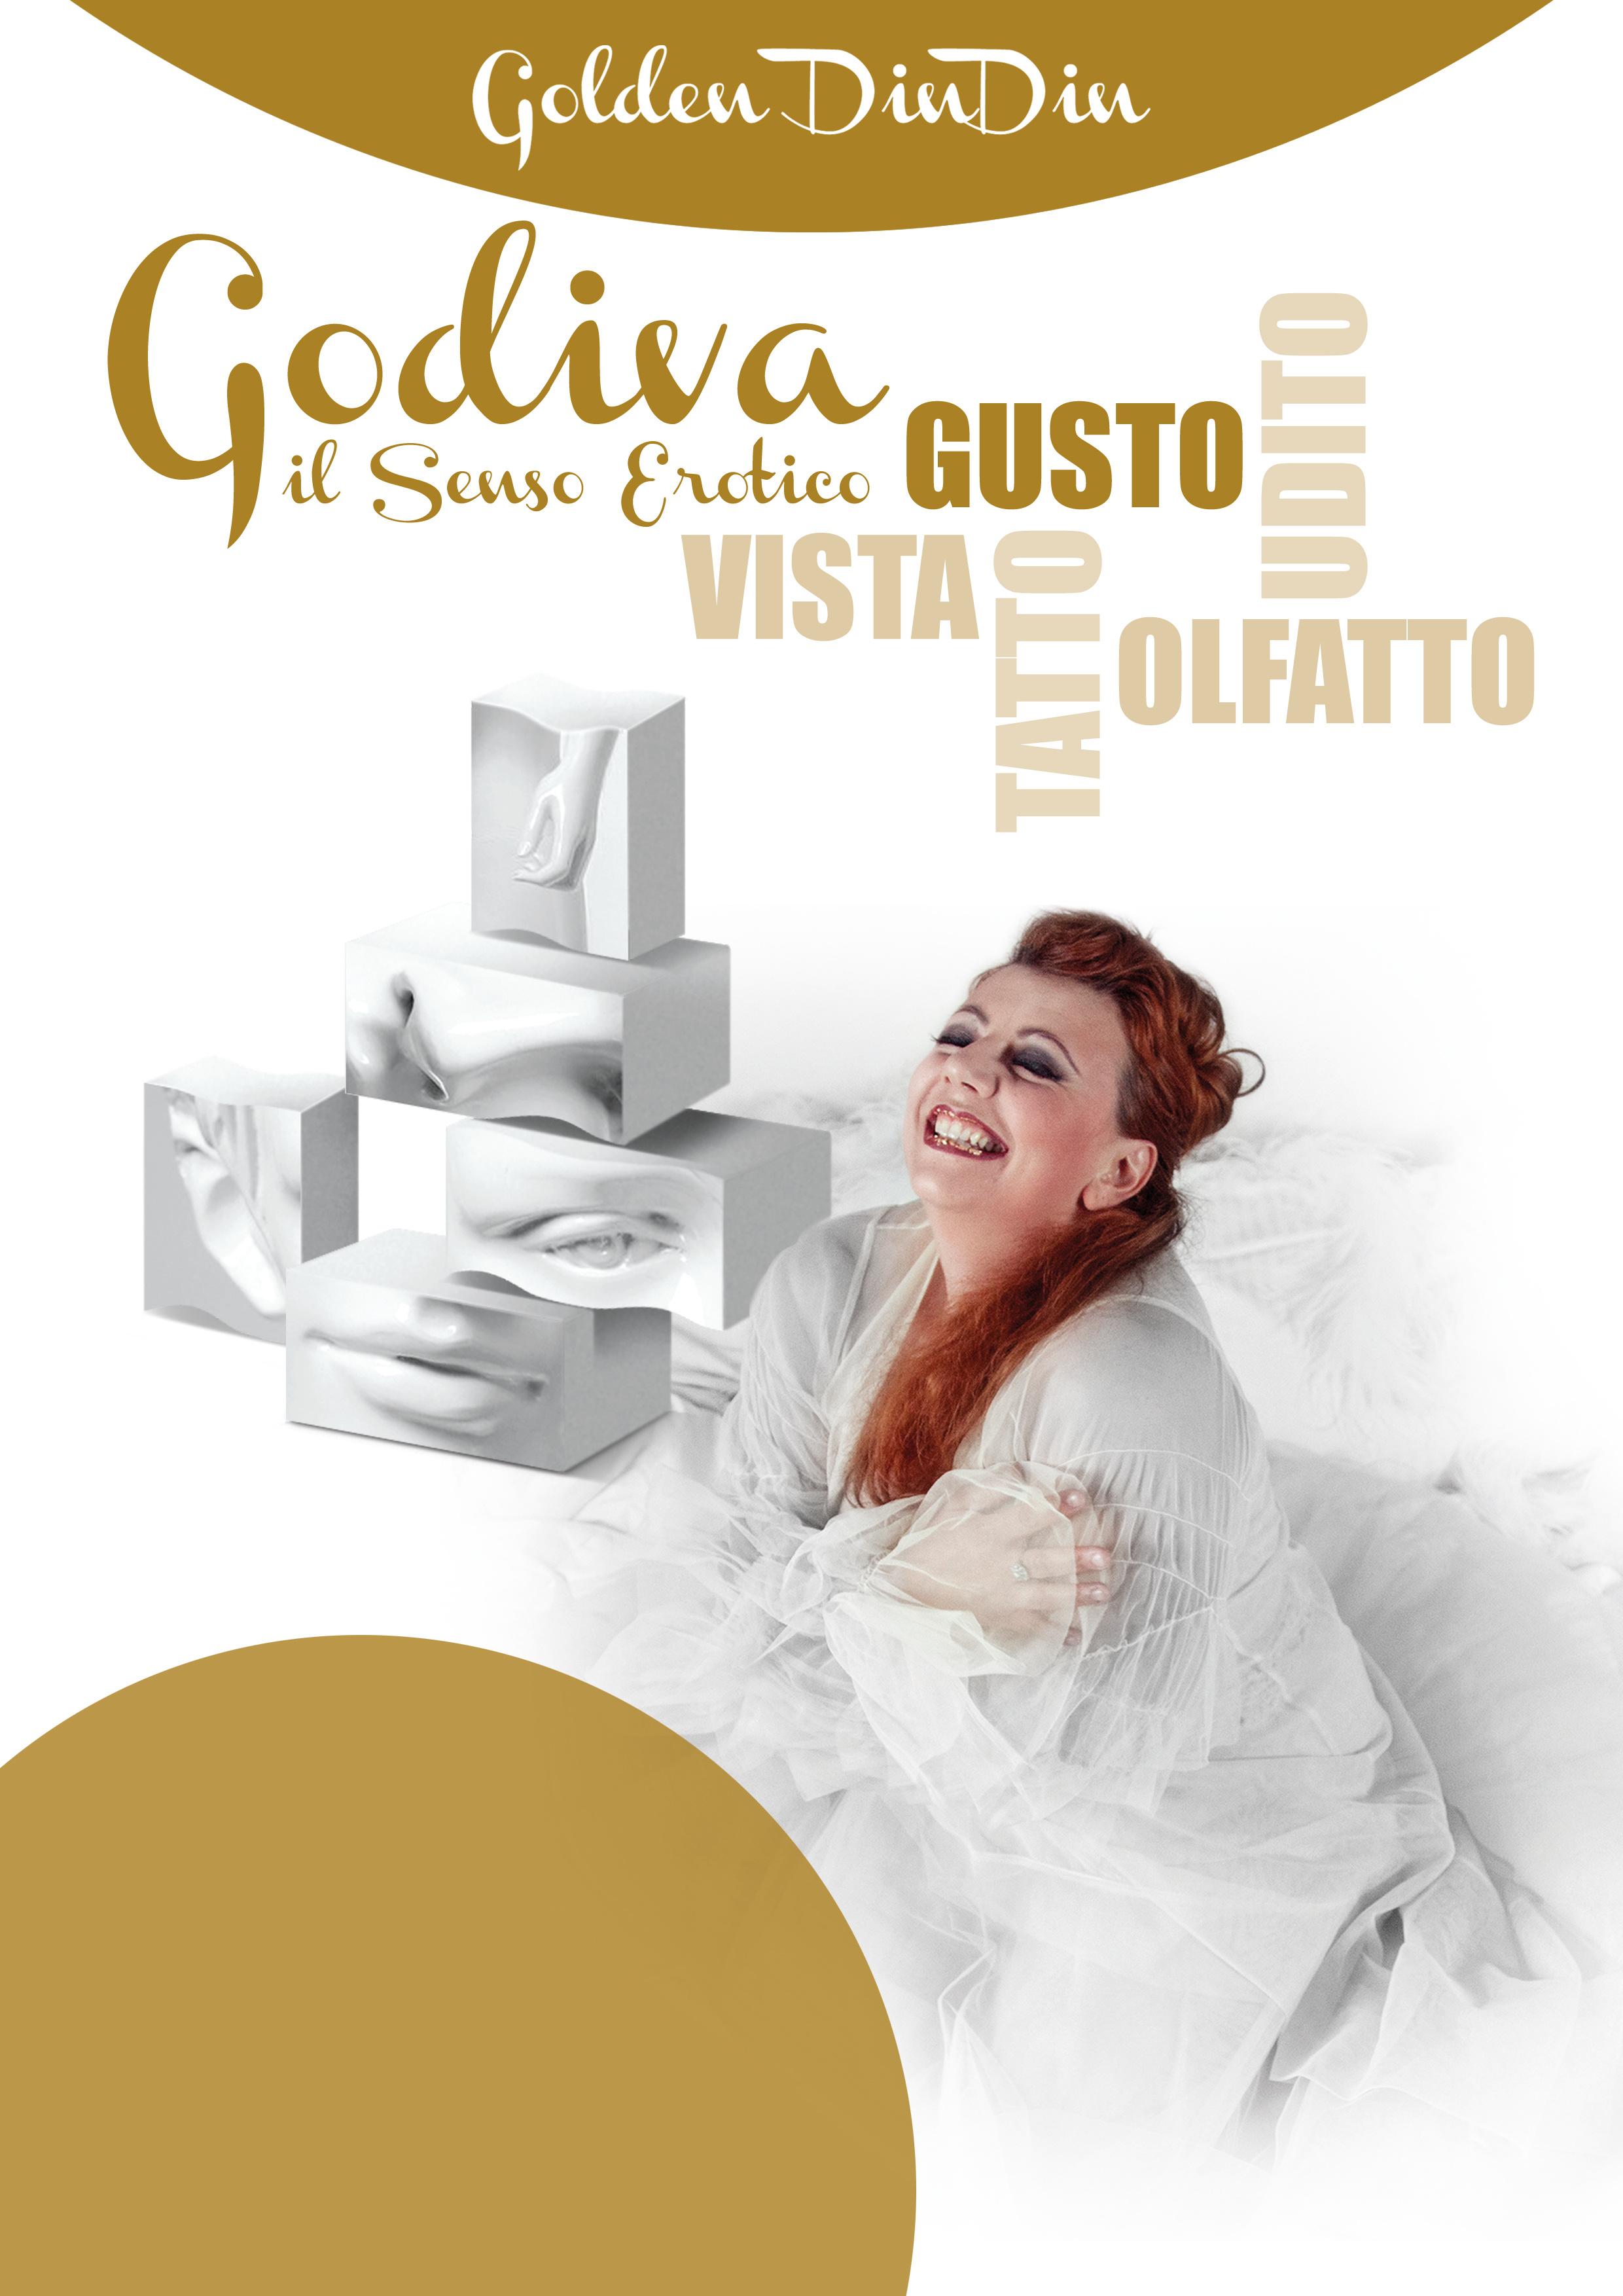 Godiva_locandina_sensi_neutra_bollo